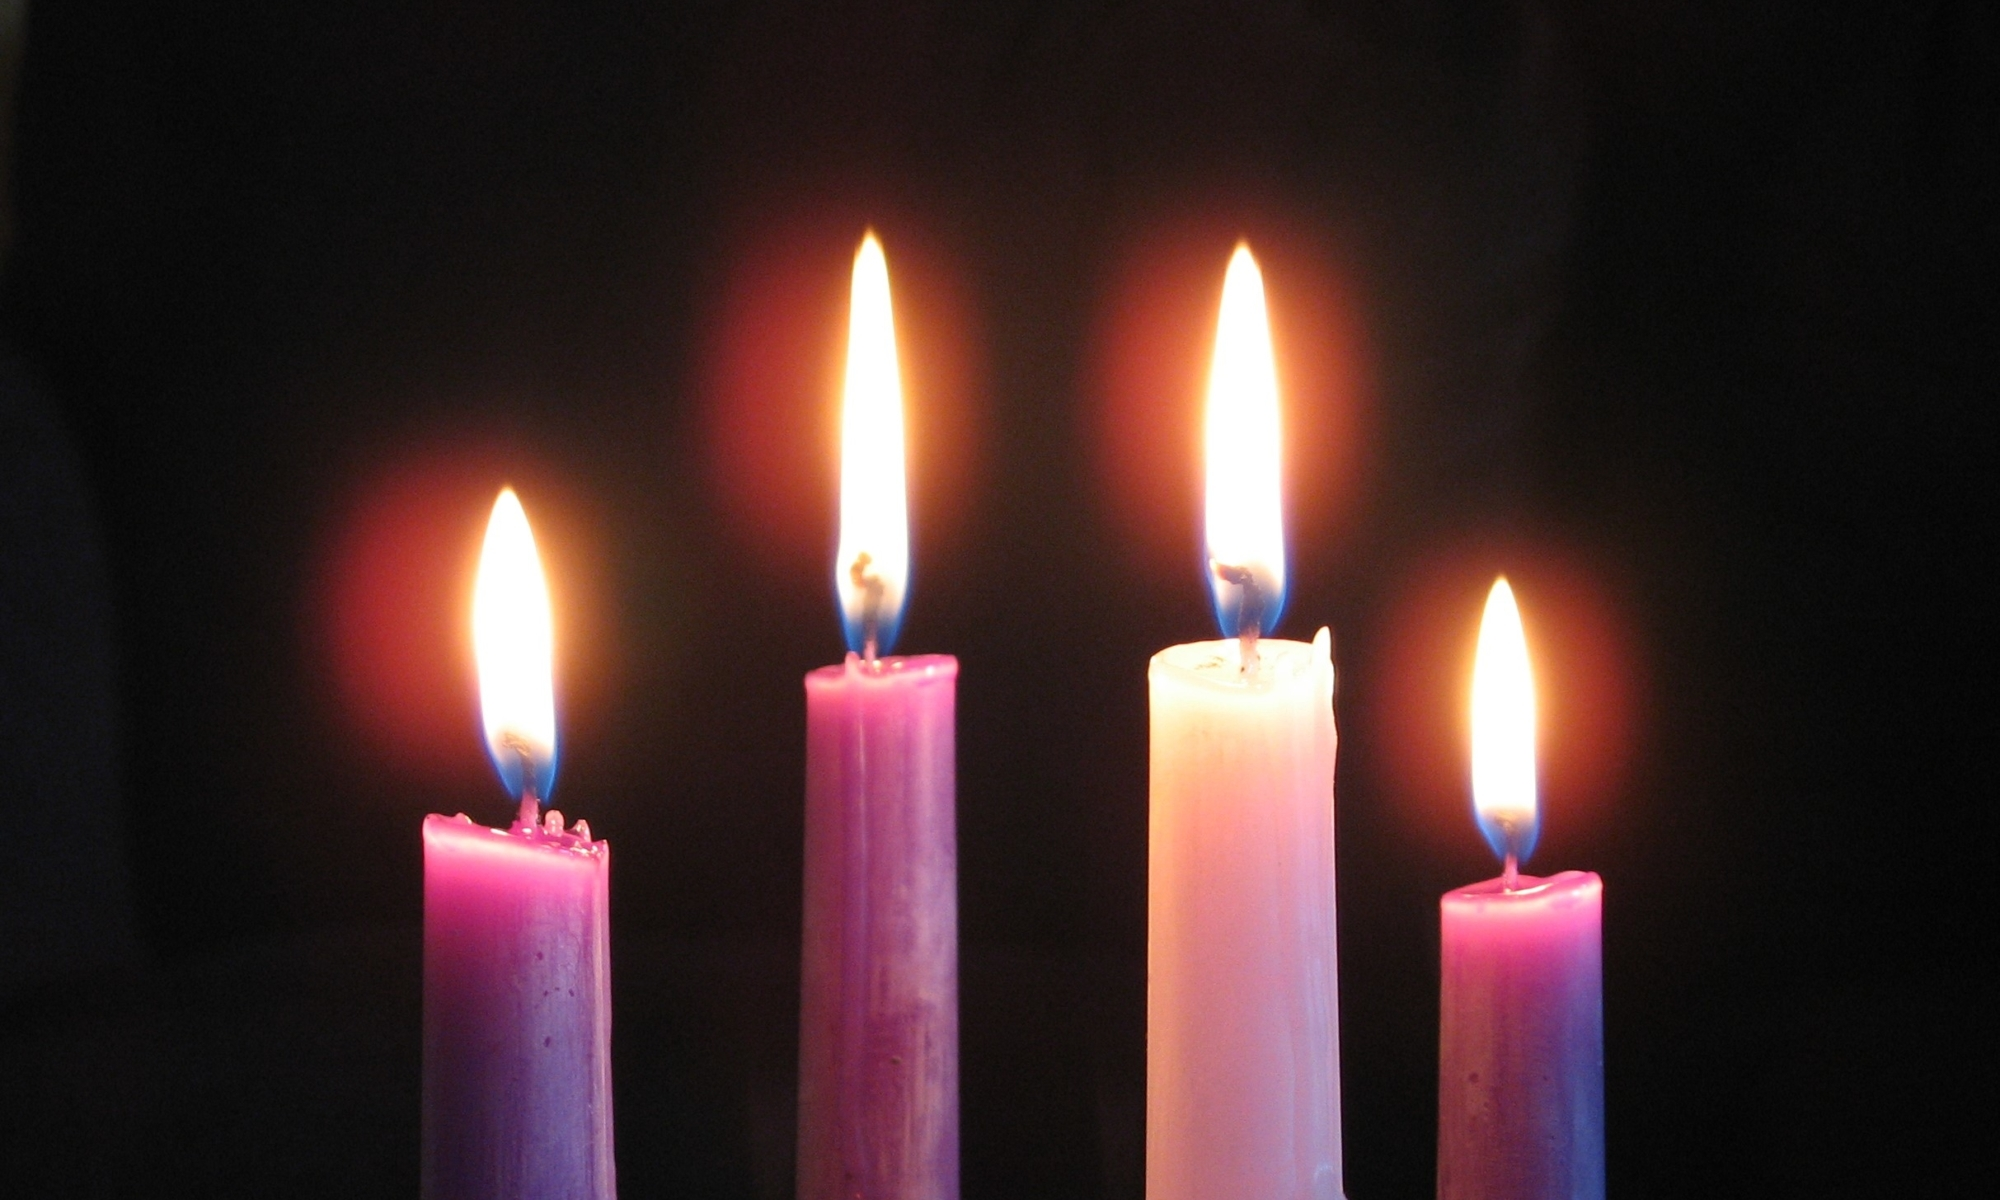 Christian blog for women – Women of Faith – Light an Advent Candle